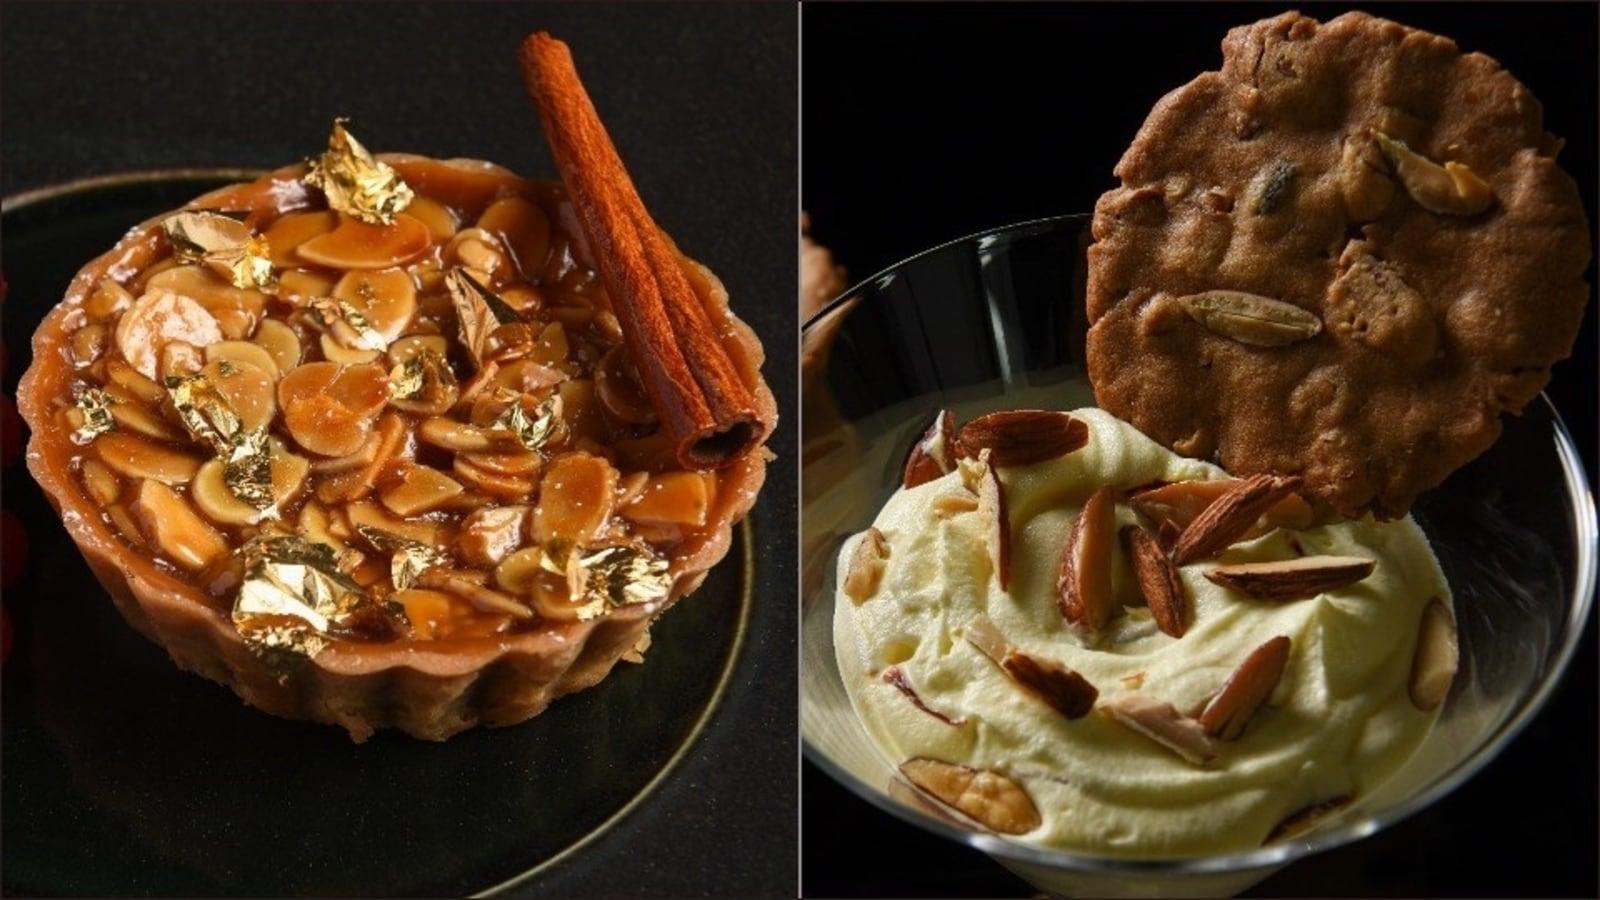 Almond cinnamon tart or badam milk mousse with almond biscuit? Pick your dessert